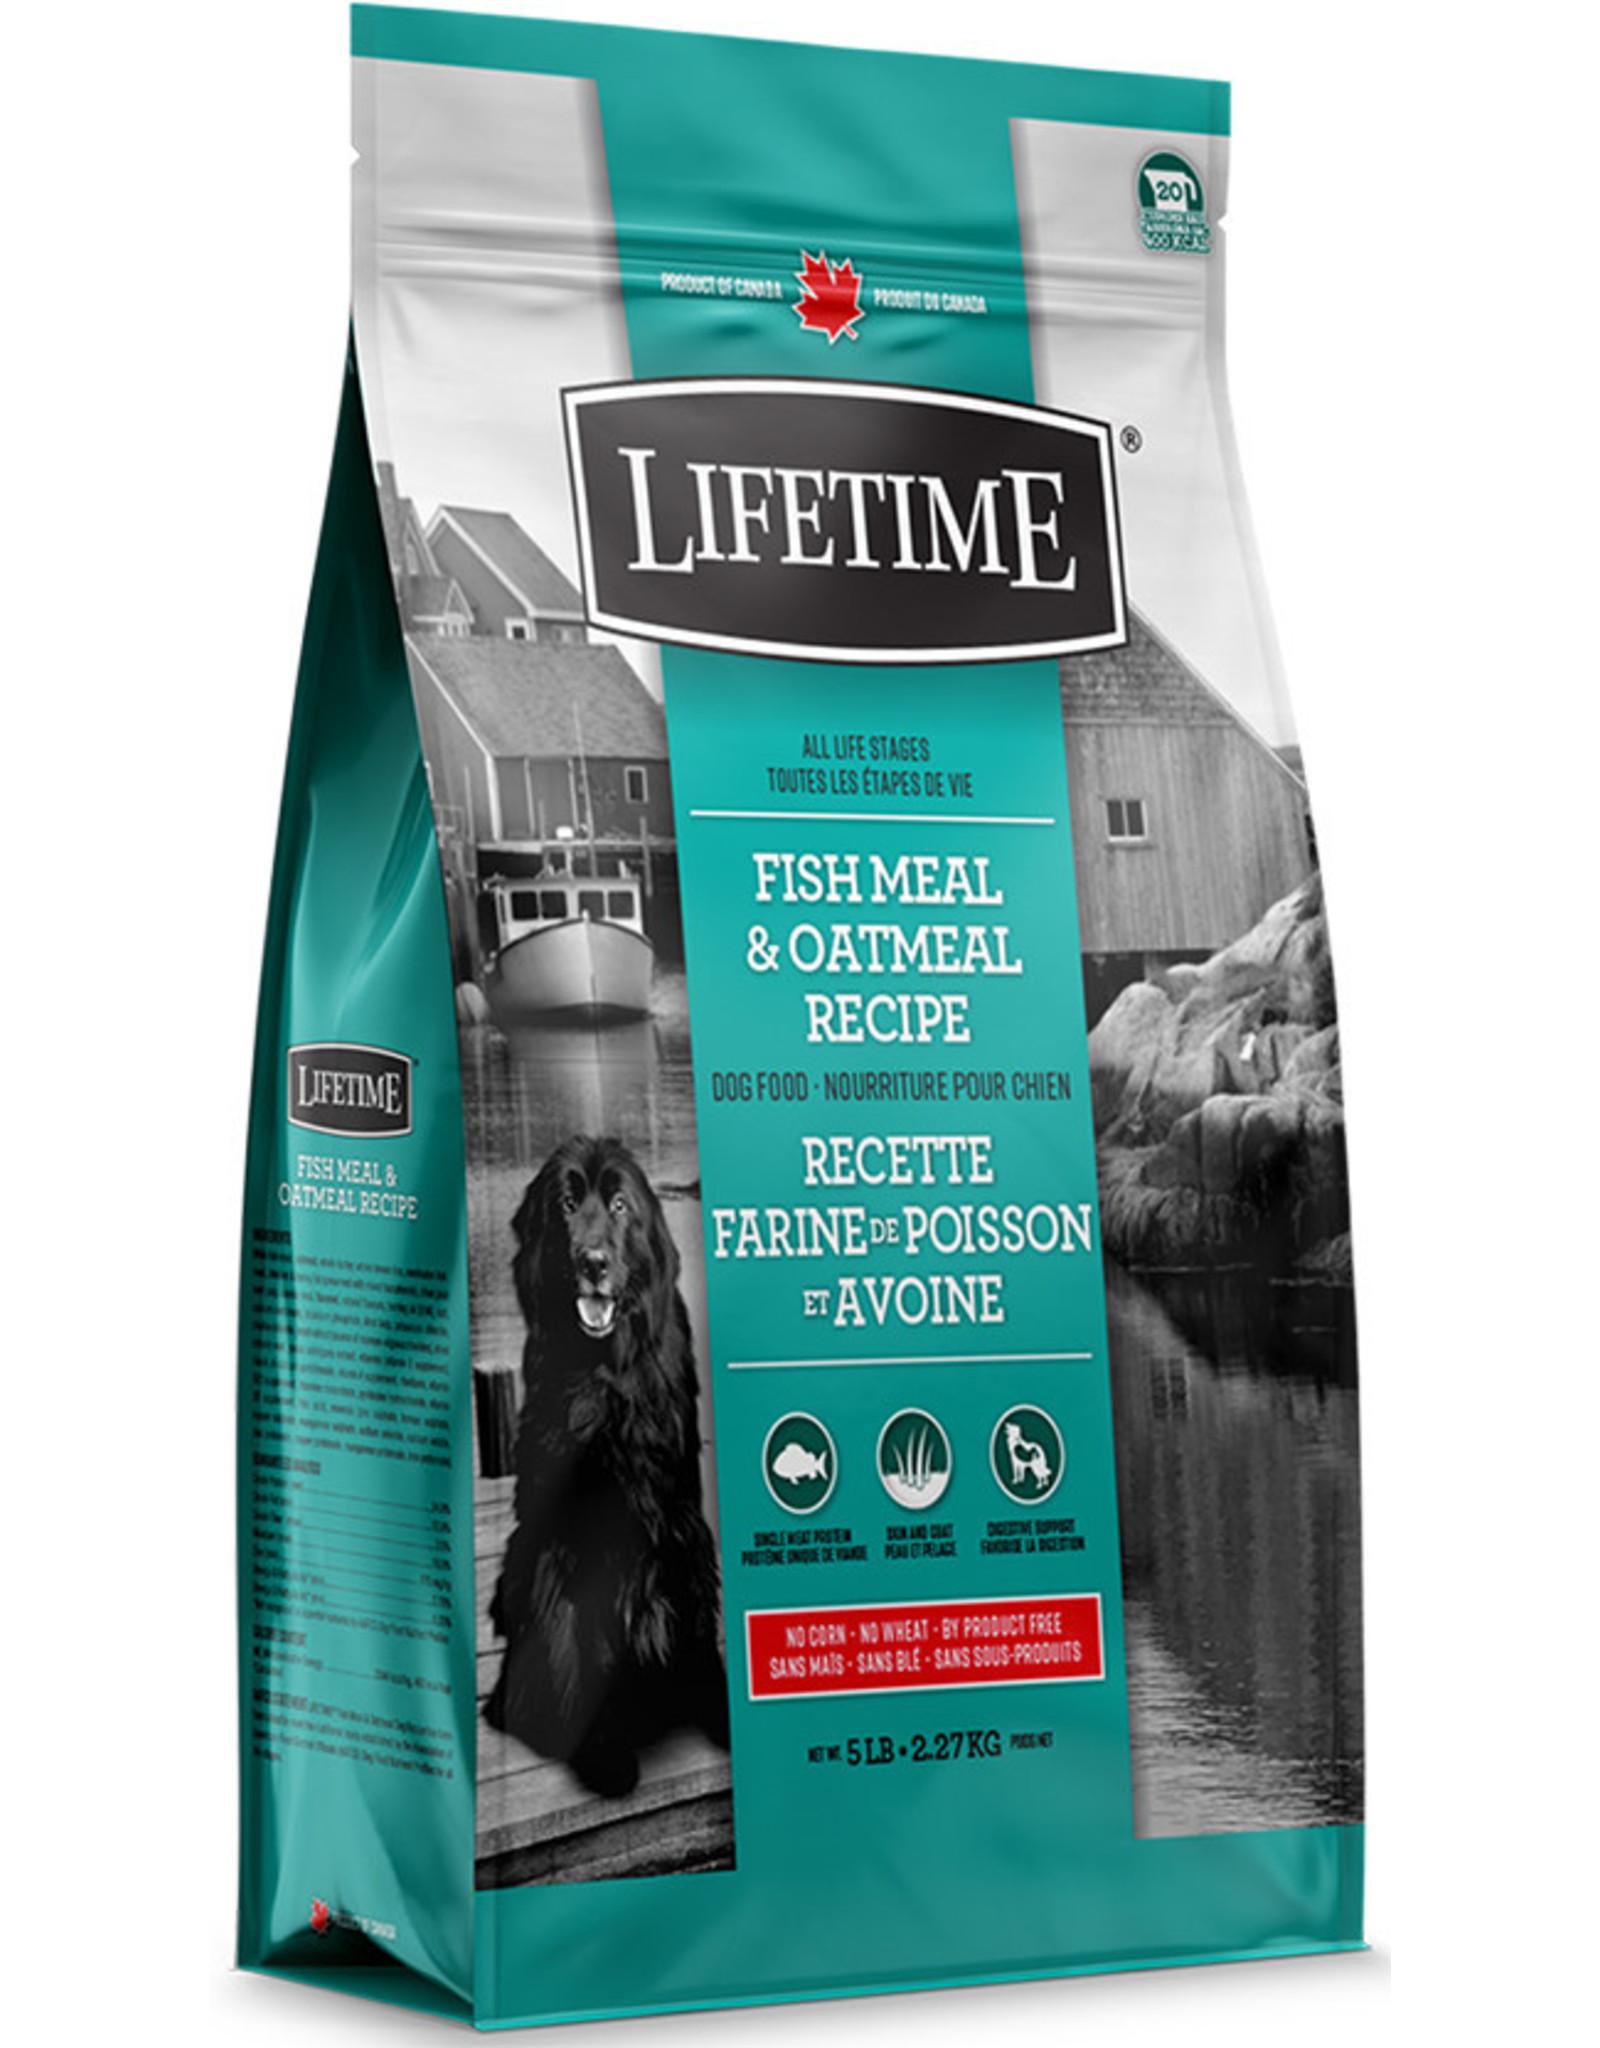 Lifetime Lifetime Fish & Oatmeal 2.27kg